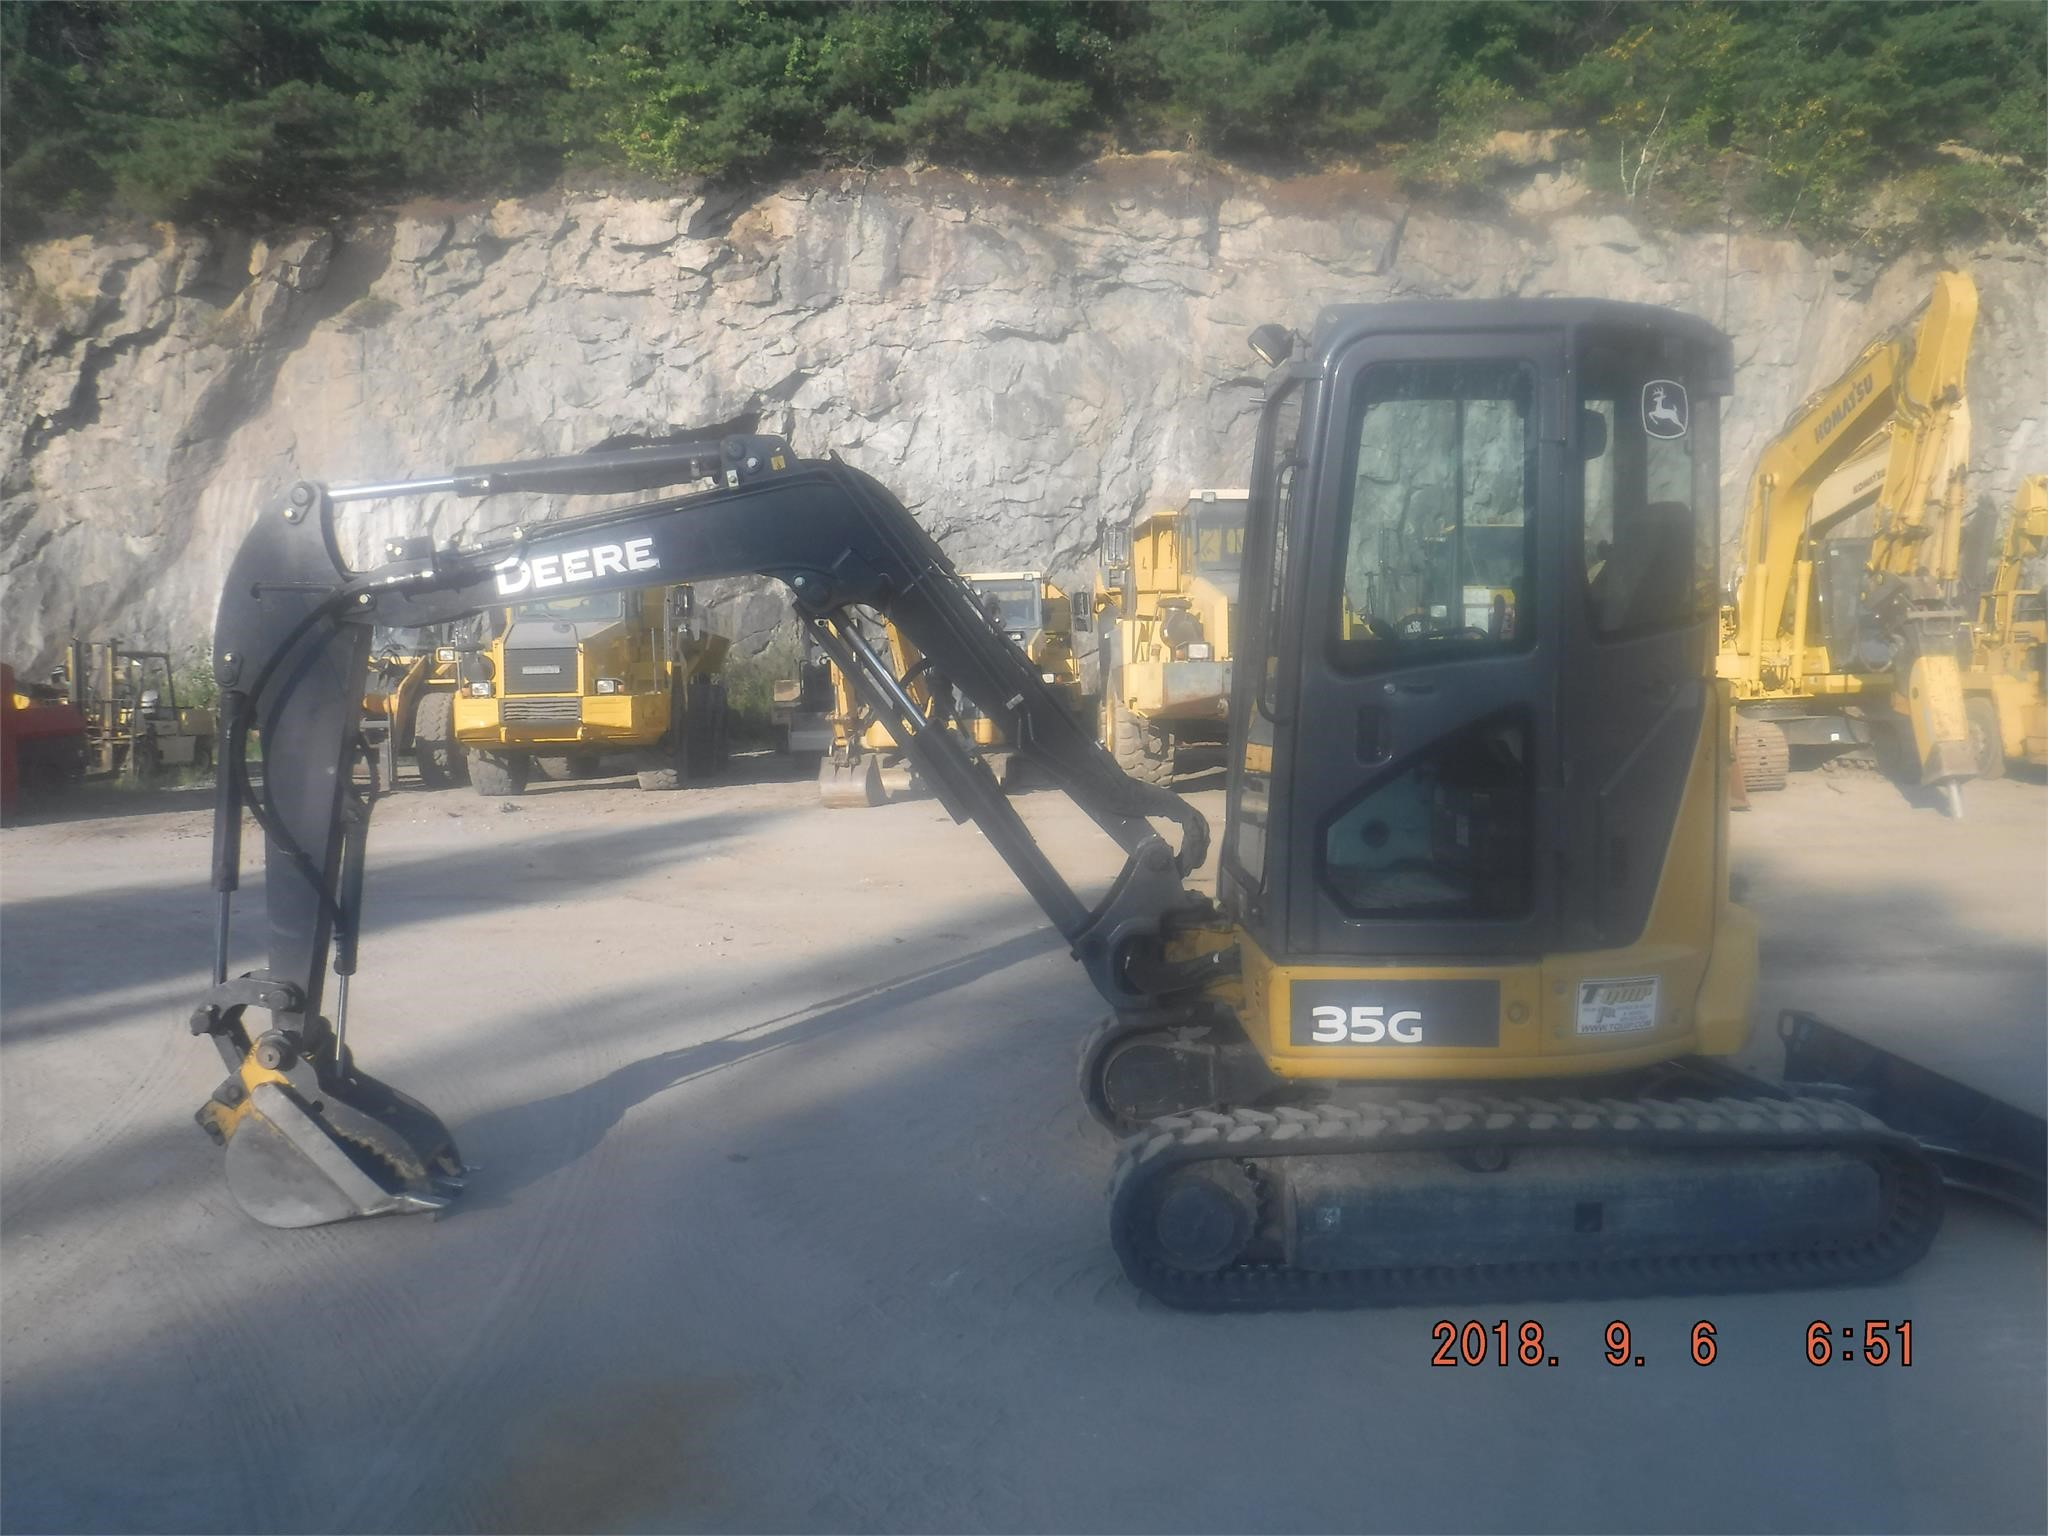 All John Deere Compact Excavators for Sale | CEG